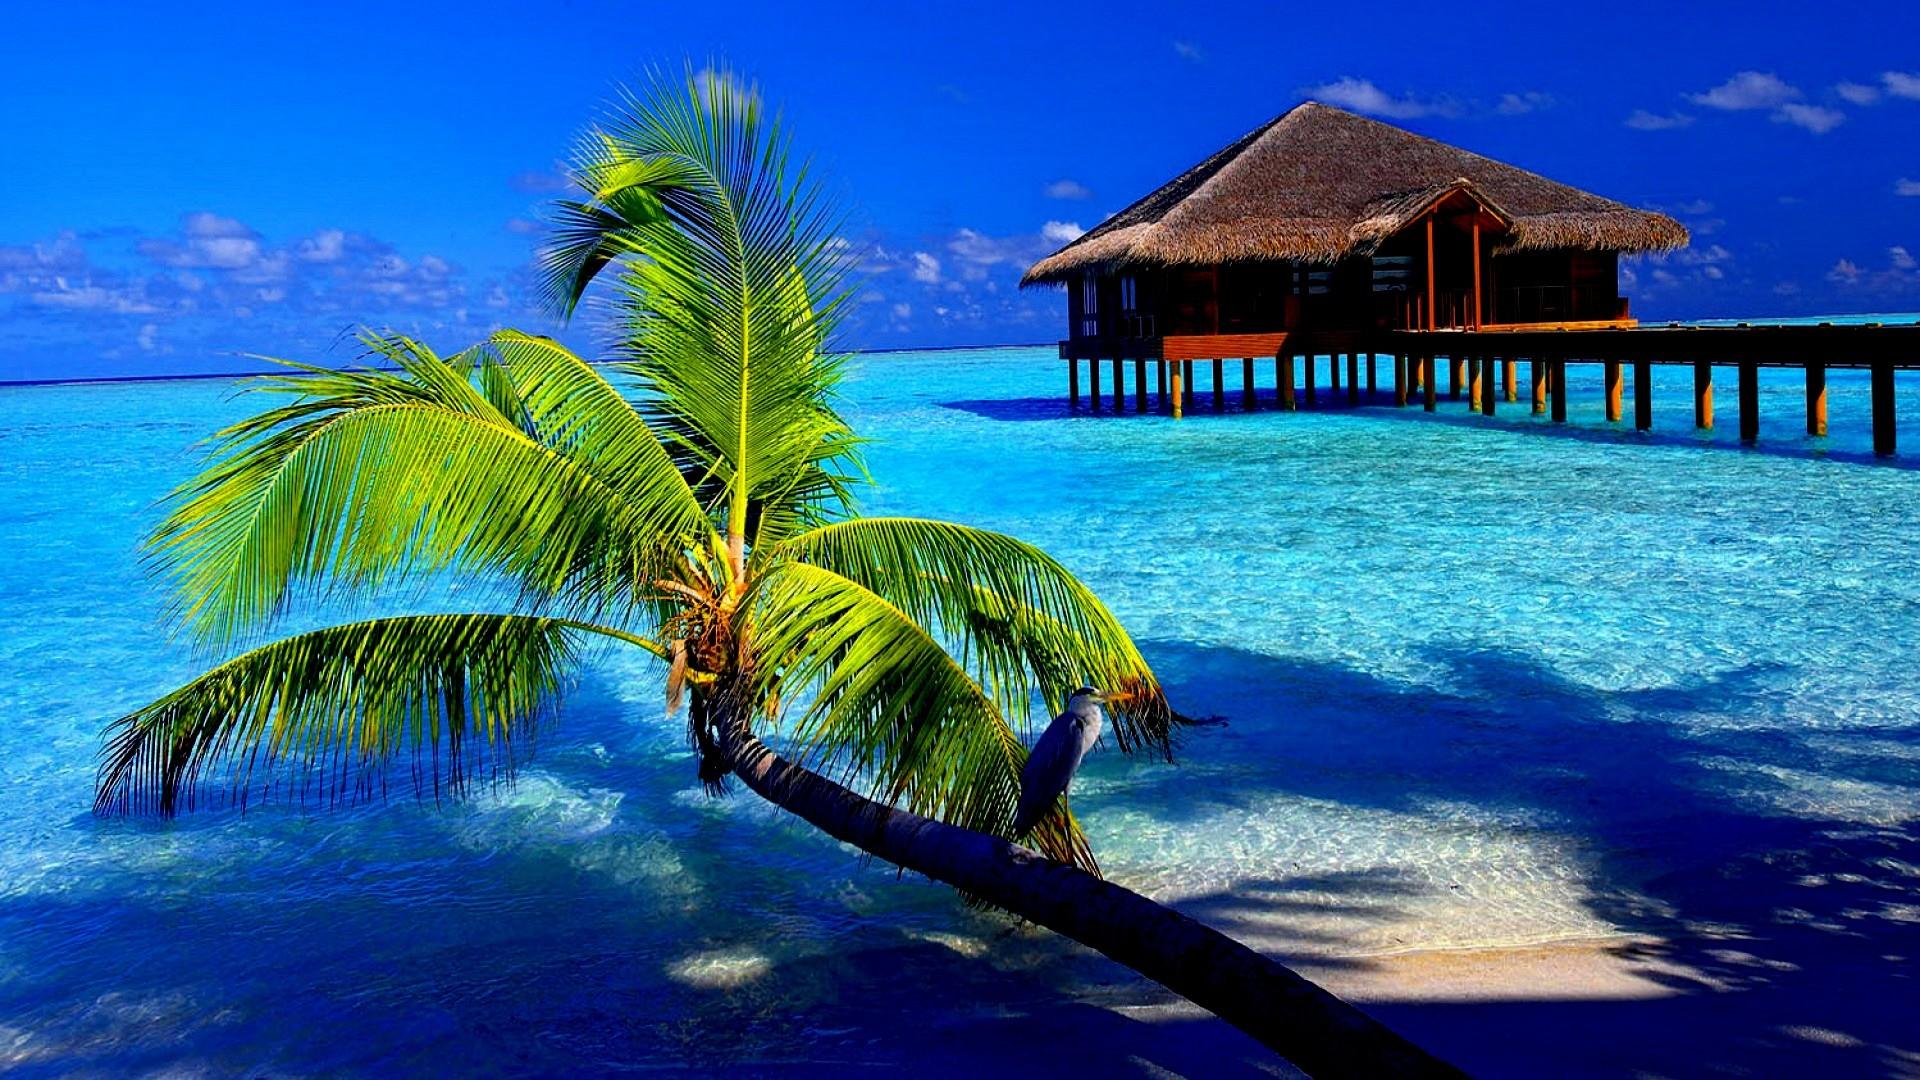 Tropical Beach Screensavers And Wallpaper: Tropical Screensavers And Wallpaper (50+ Images